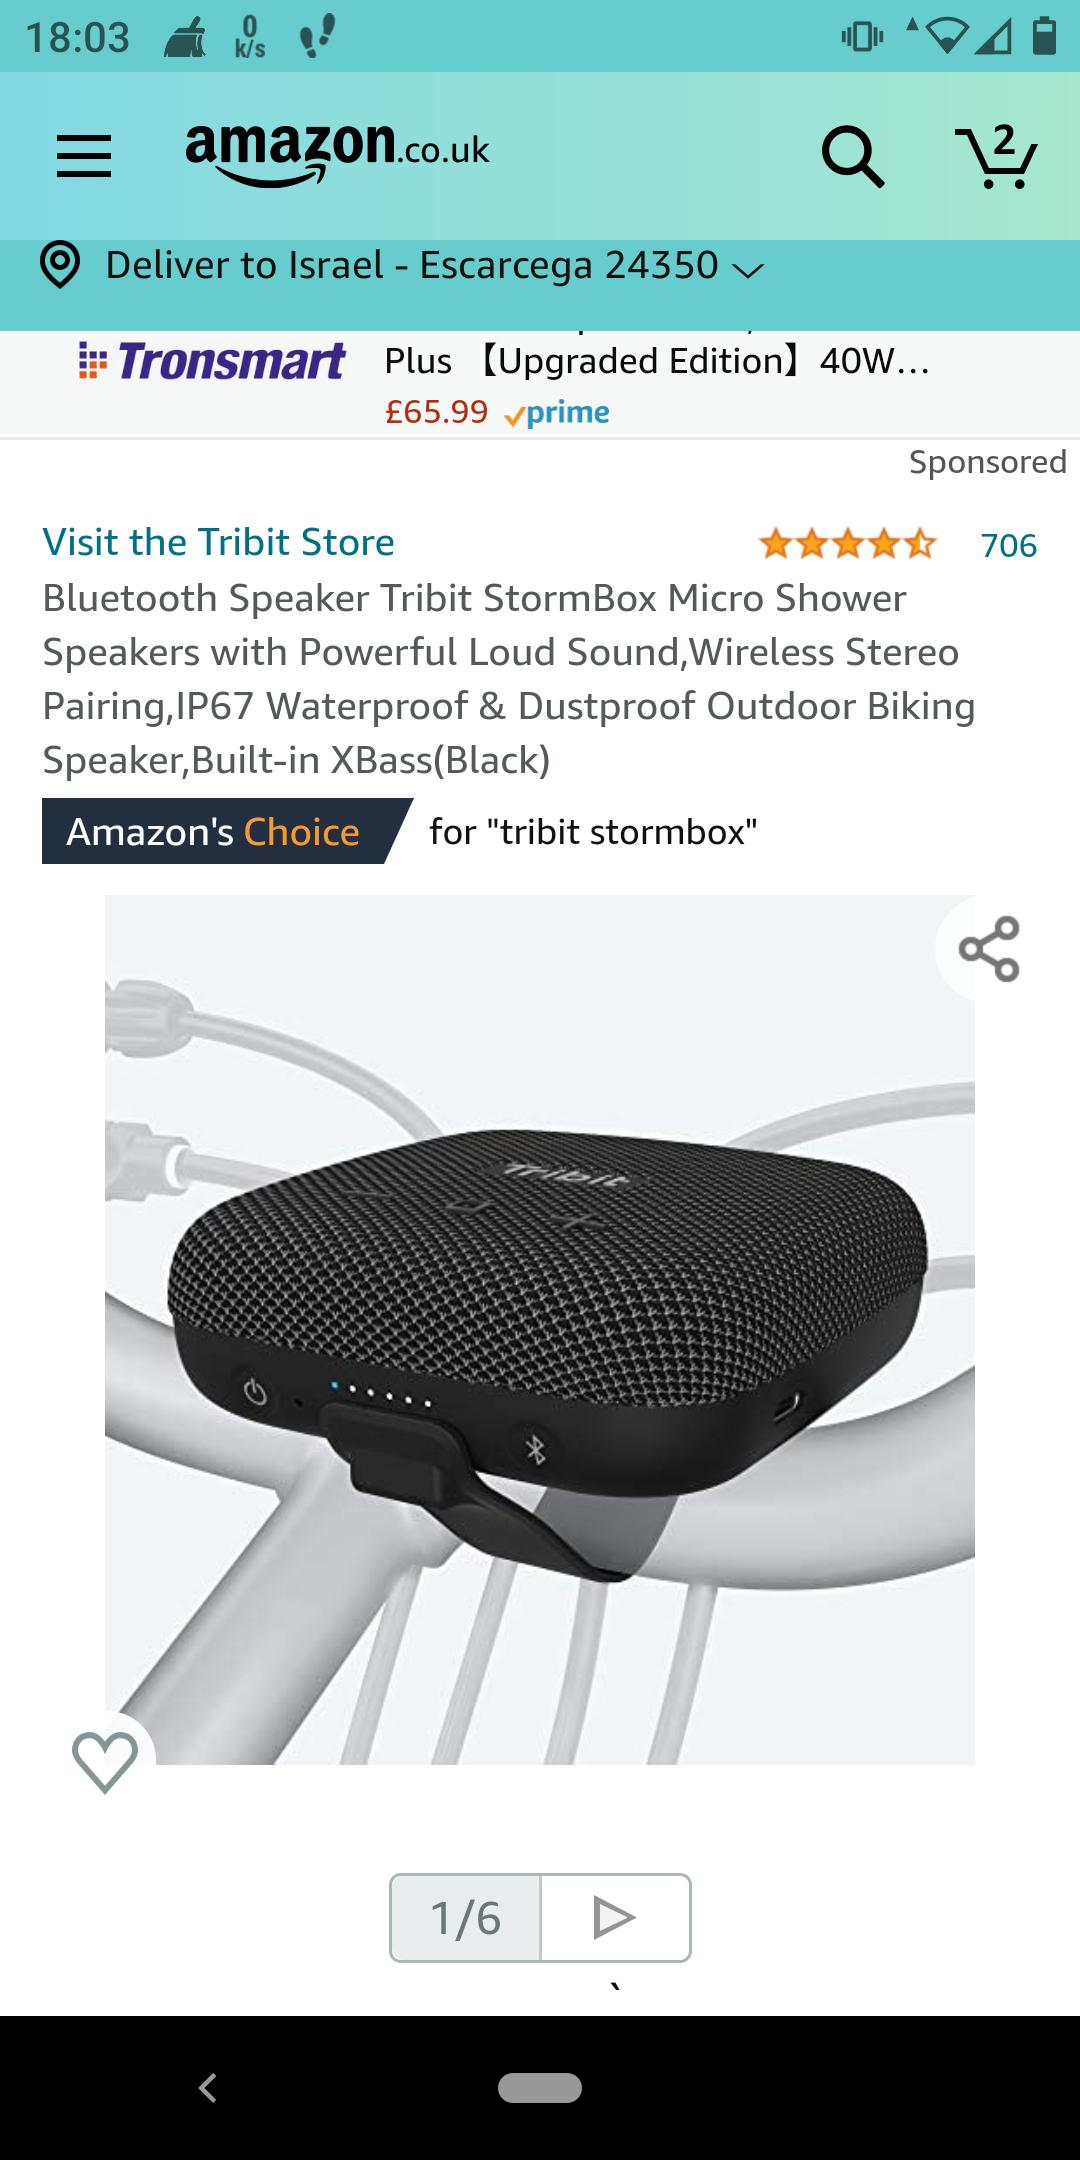 Tribit Stormbox Micro - Bocina portatil: Amazon JP (Precio mejorado)